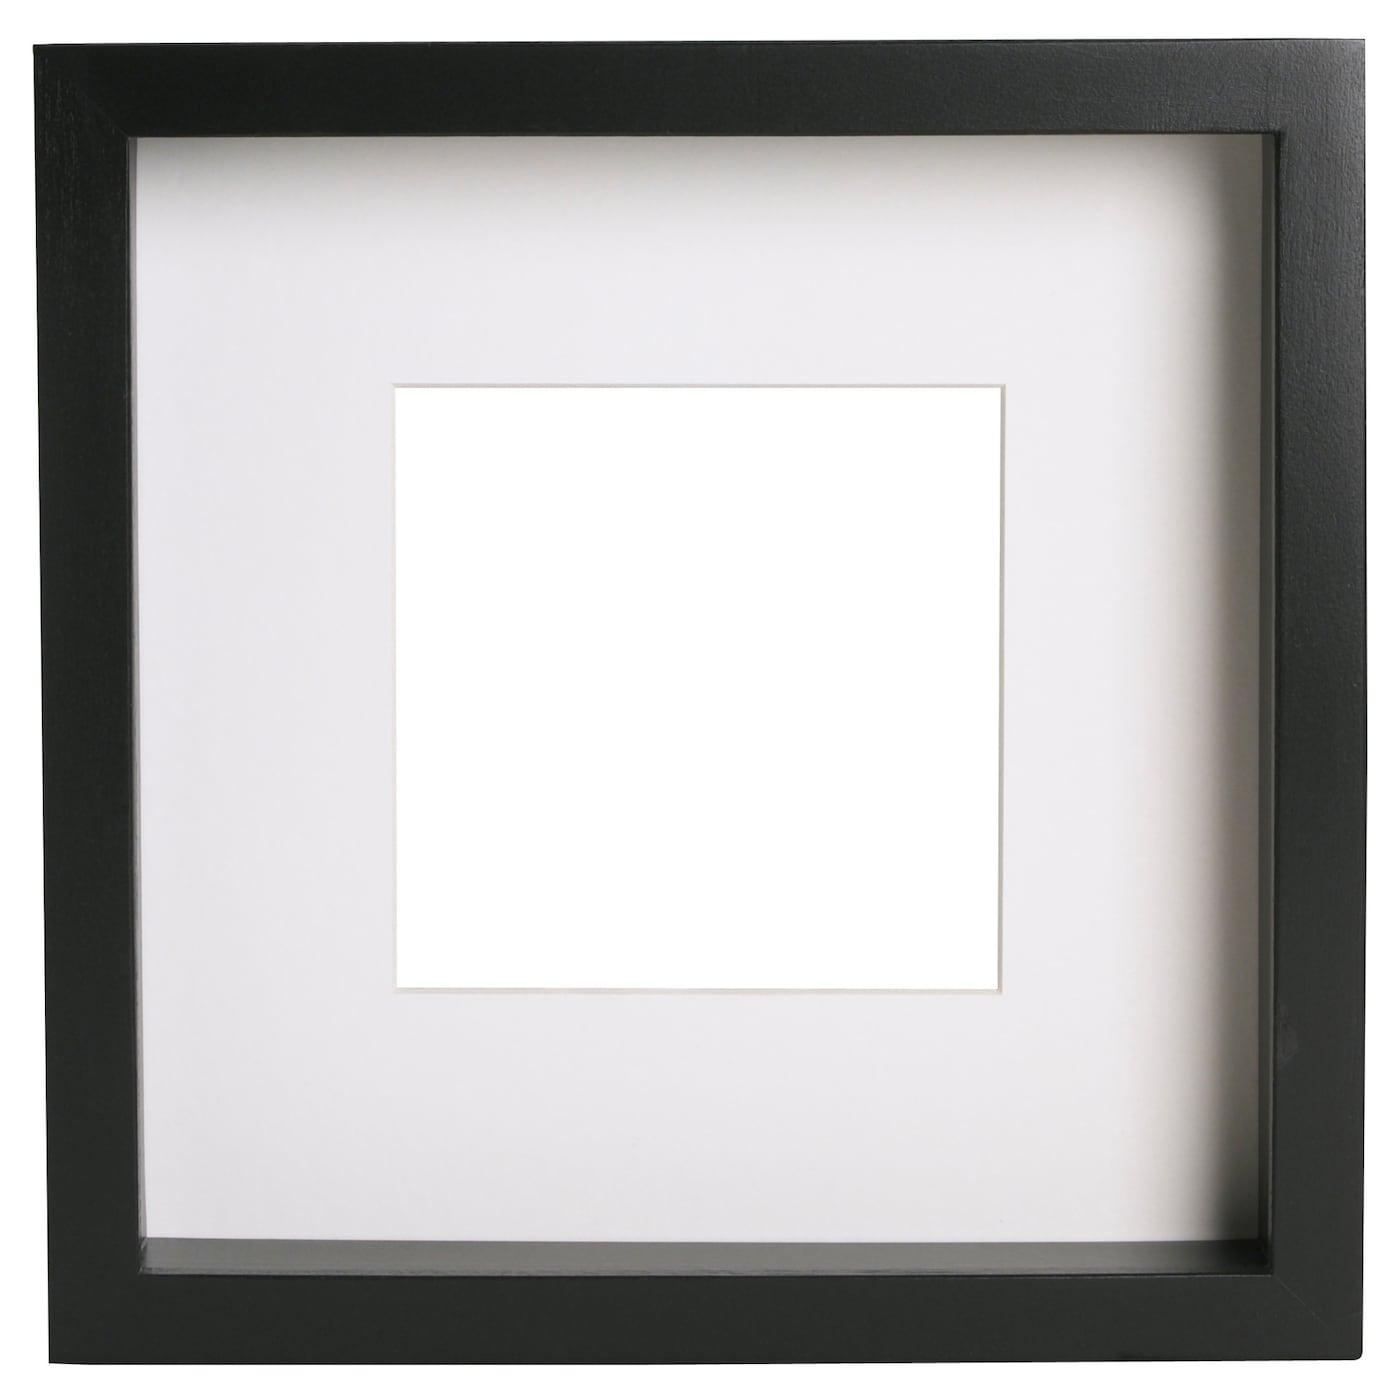 RIBBA Frame Black 23 x 23 cm - IKEA